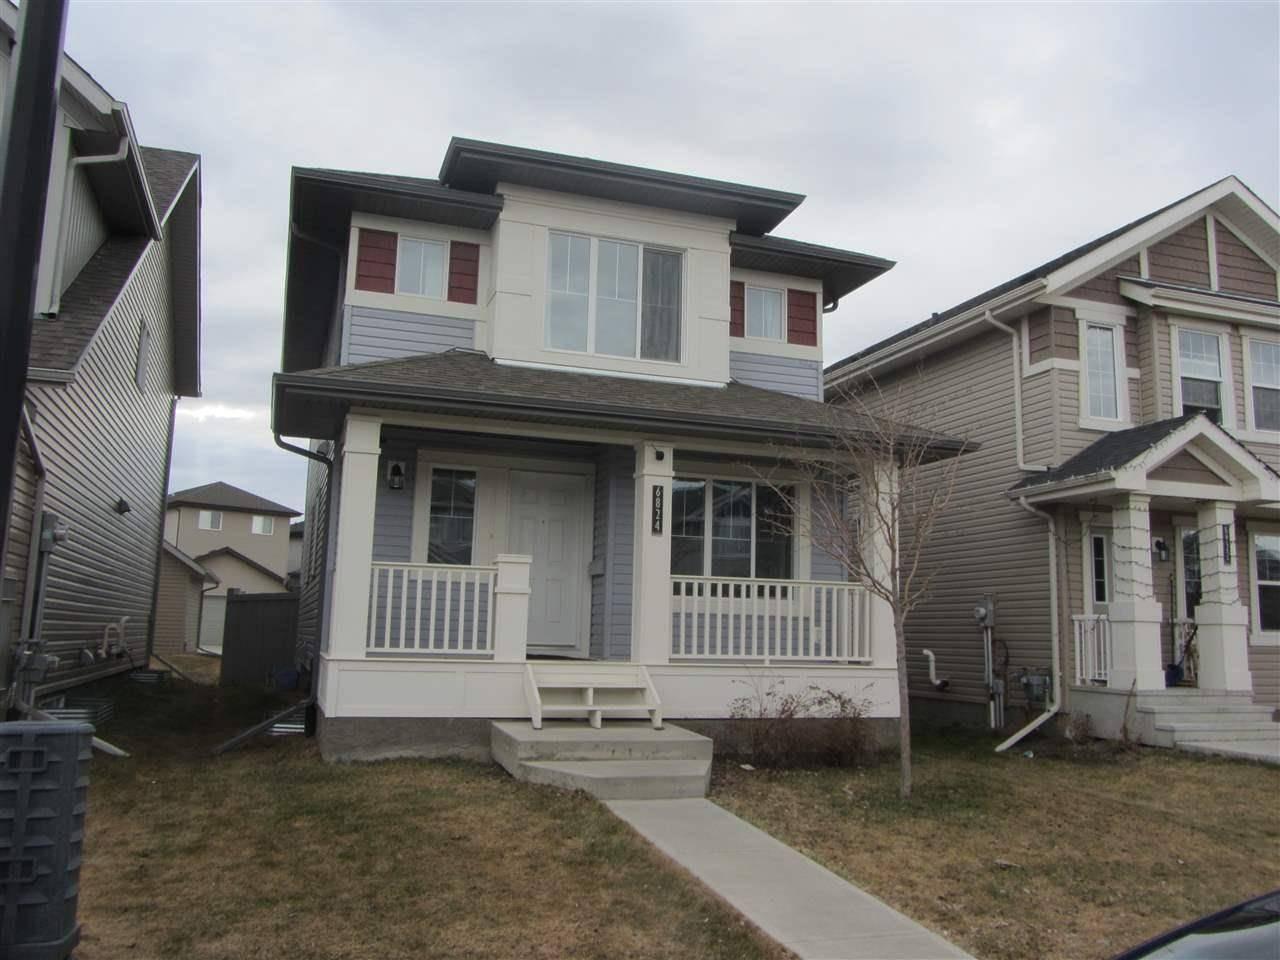 House for sale at 6824 Cardinal Li Sw Edmonton Alberta - MLS: E4192464